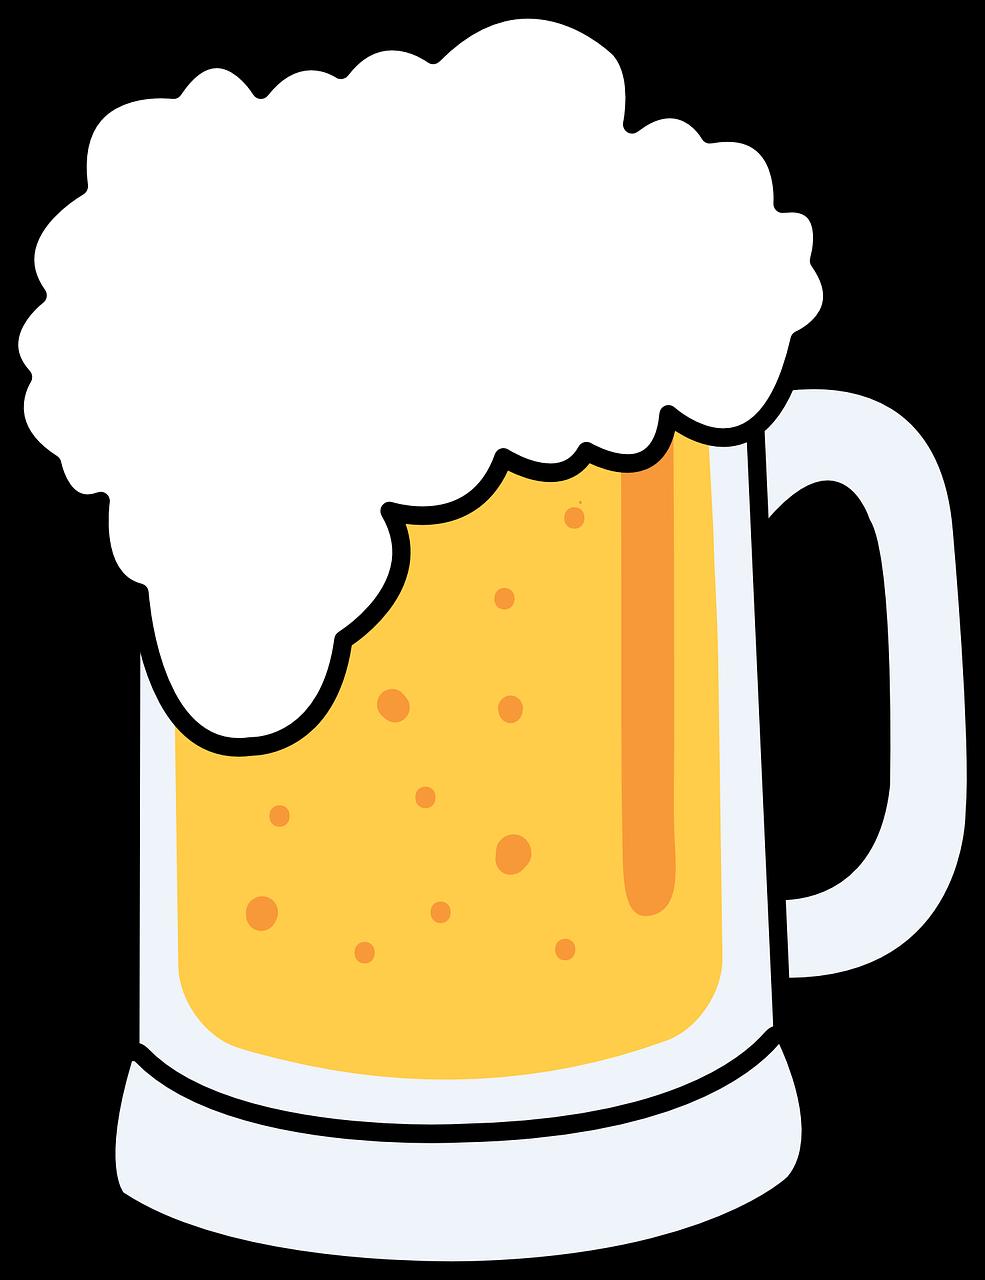 Clipart beer alcahol. Png pixels likirakshu pinterest